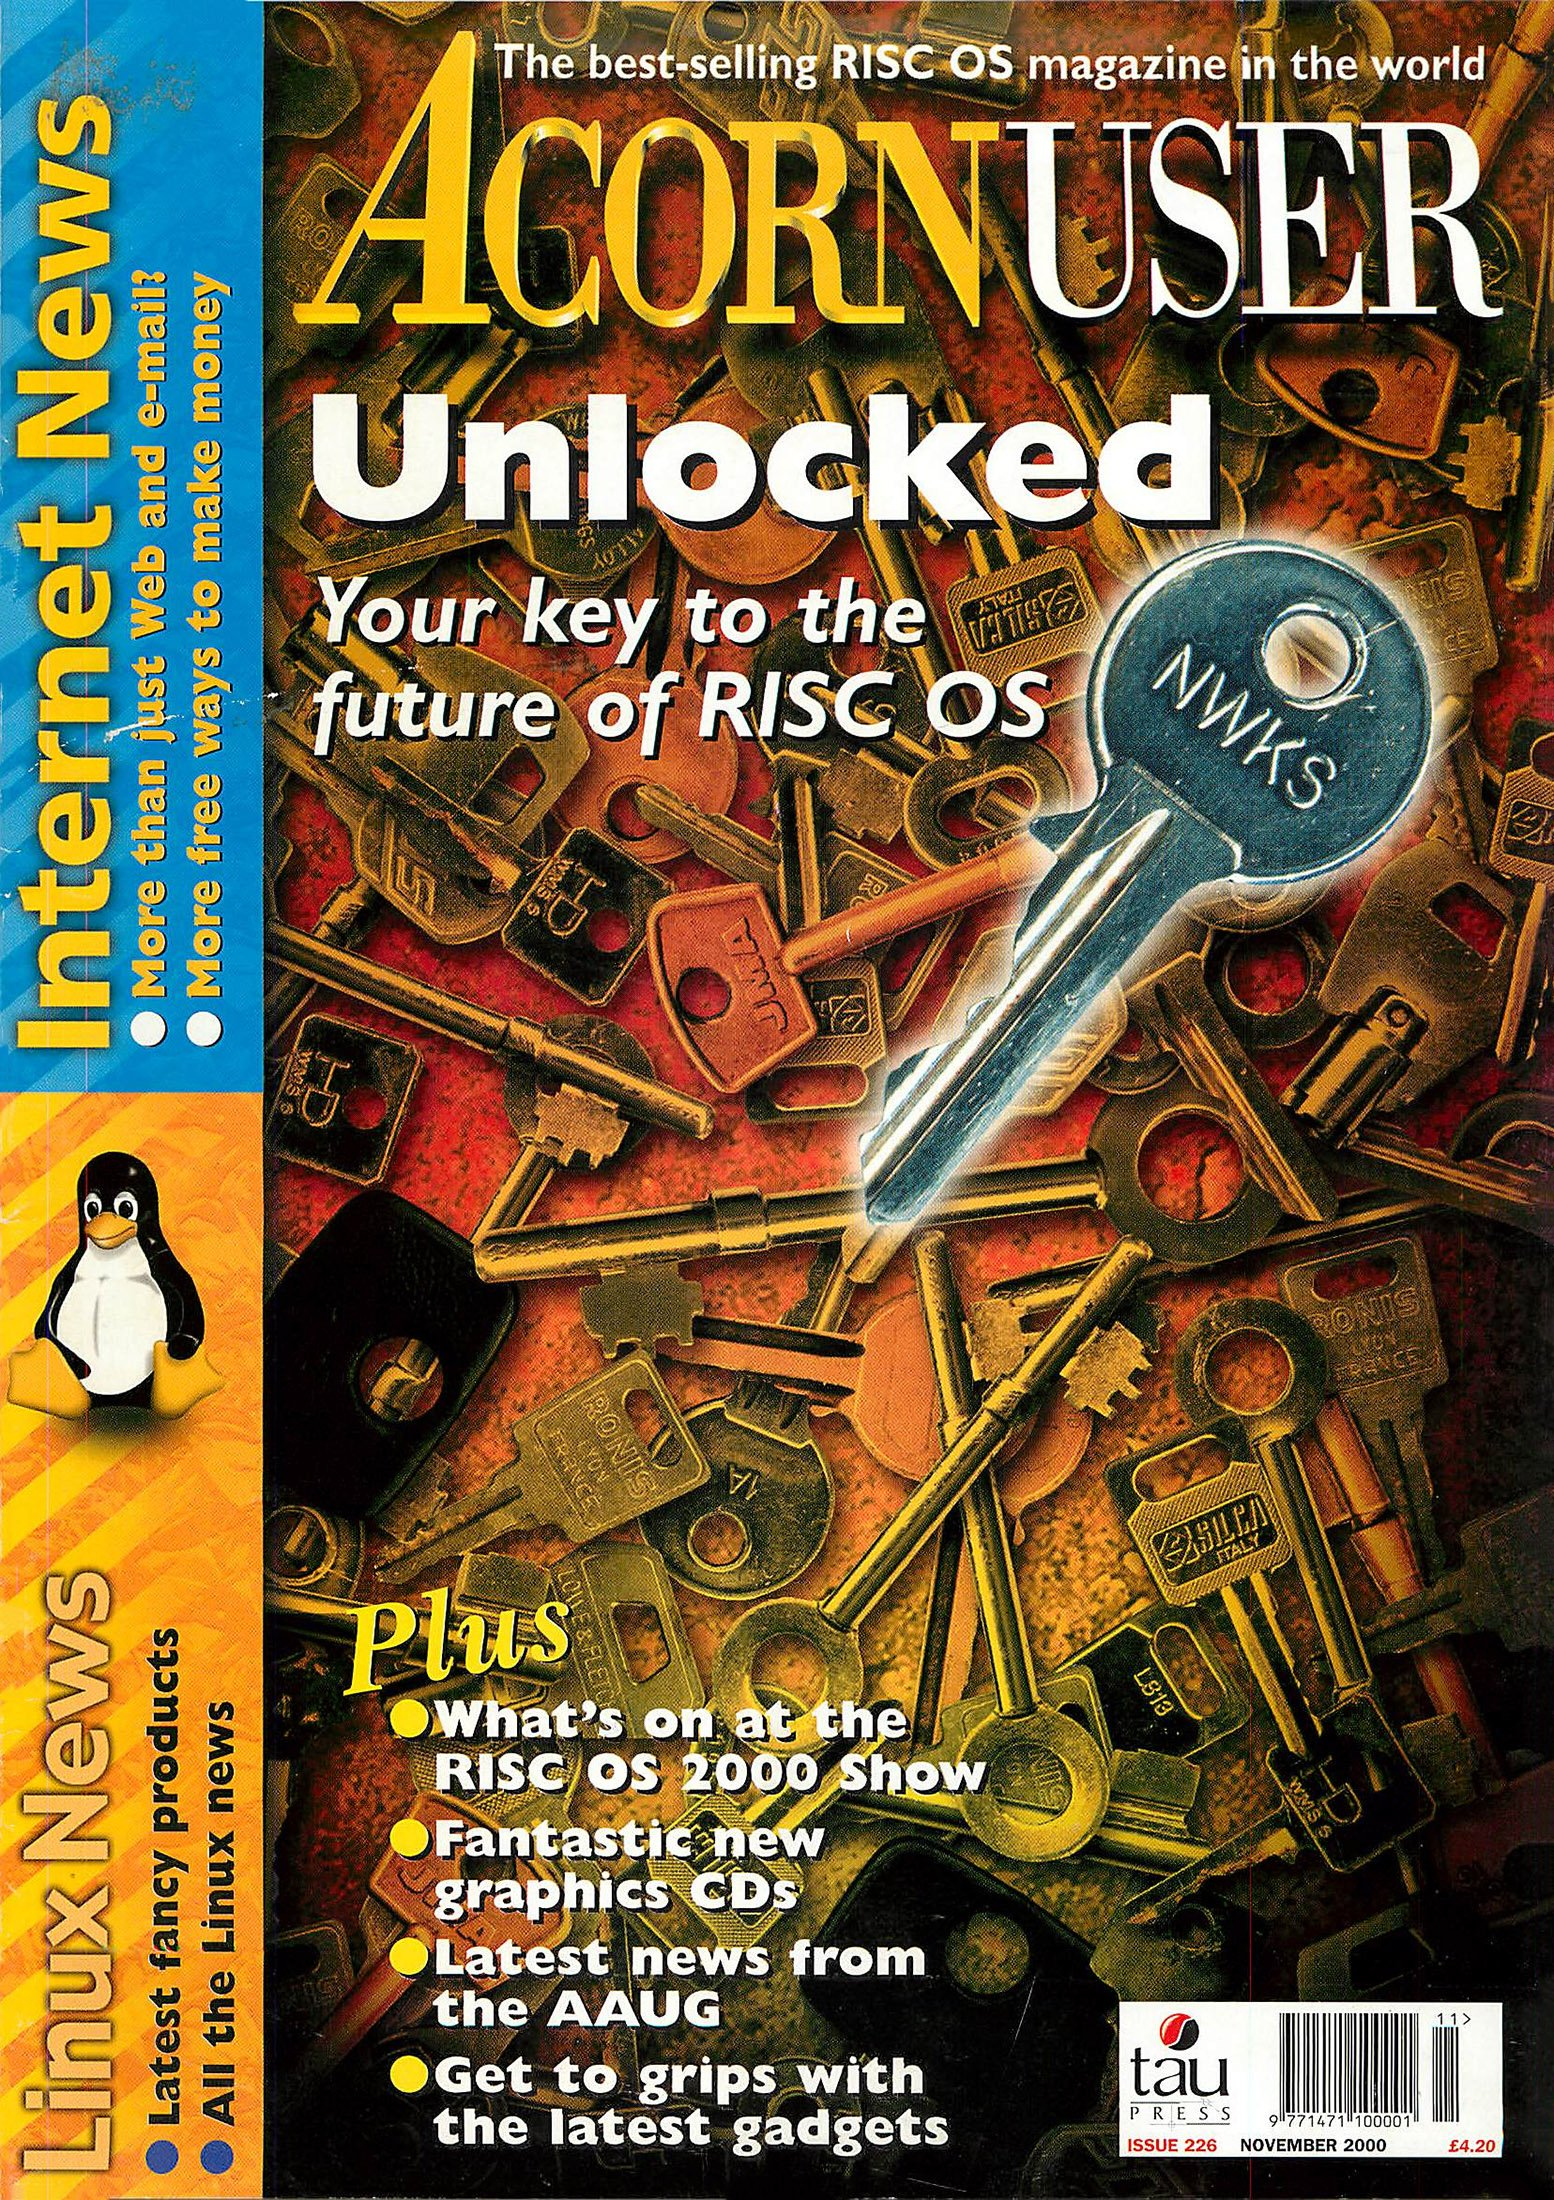 Acorn User 226 (November 2000)